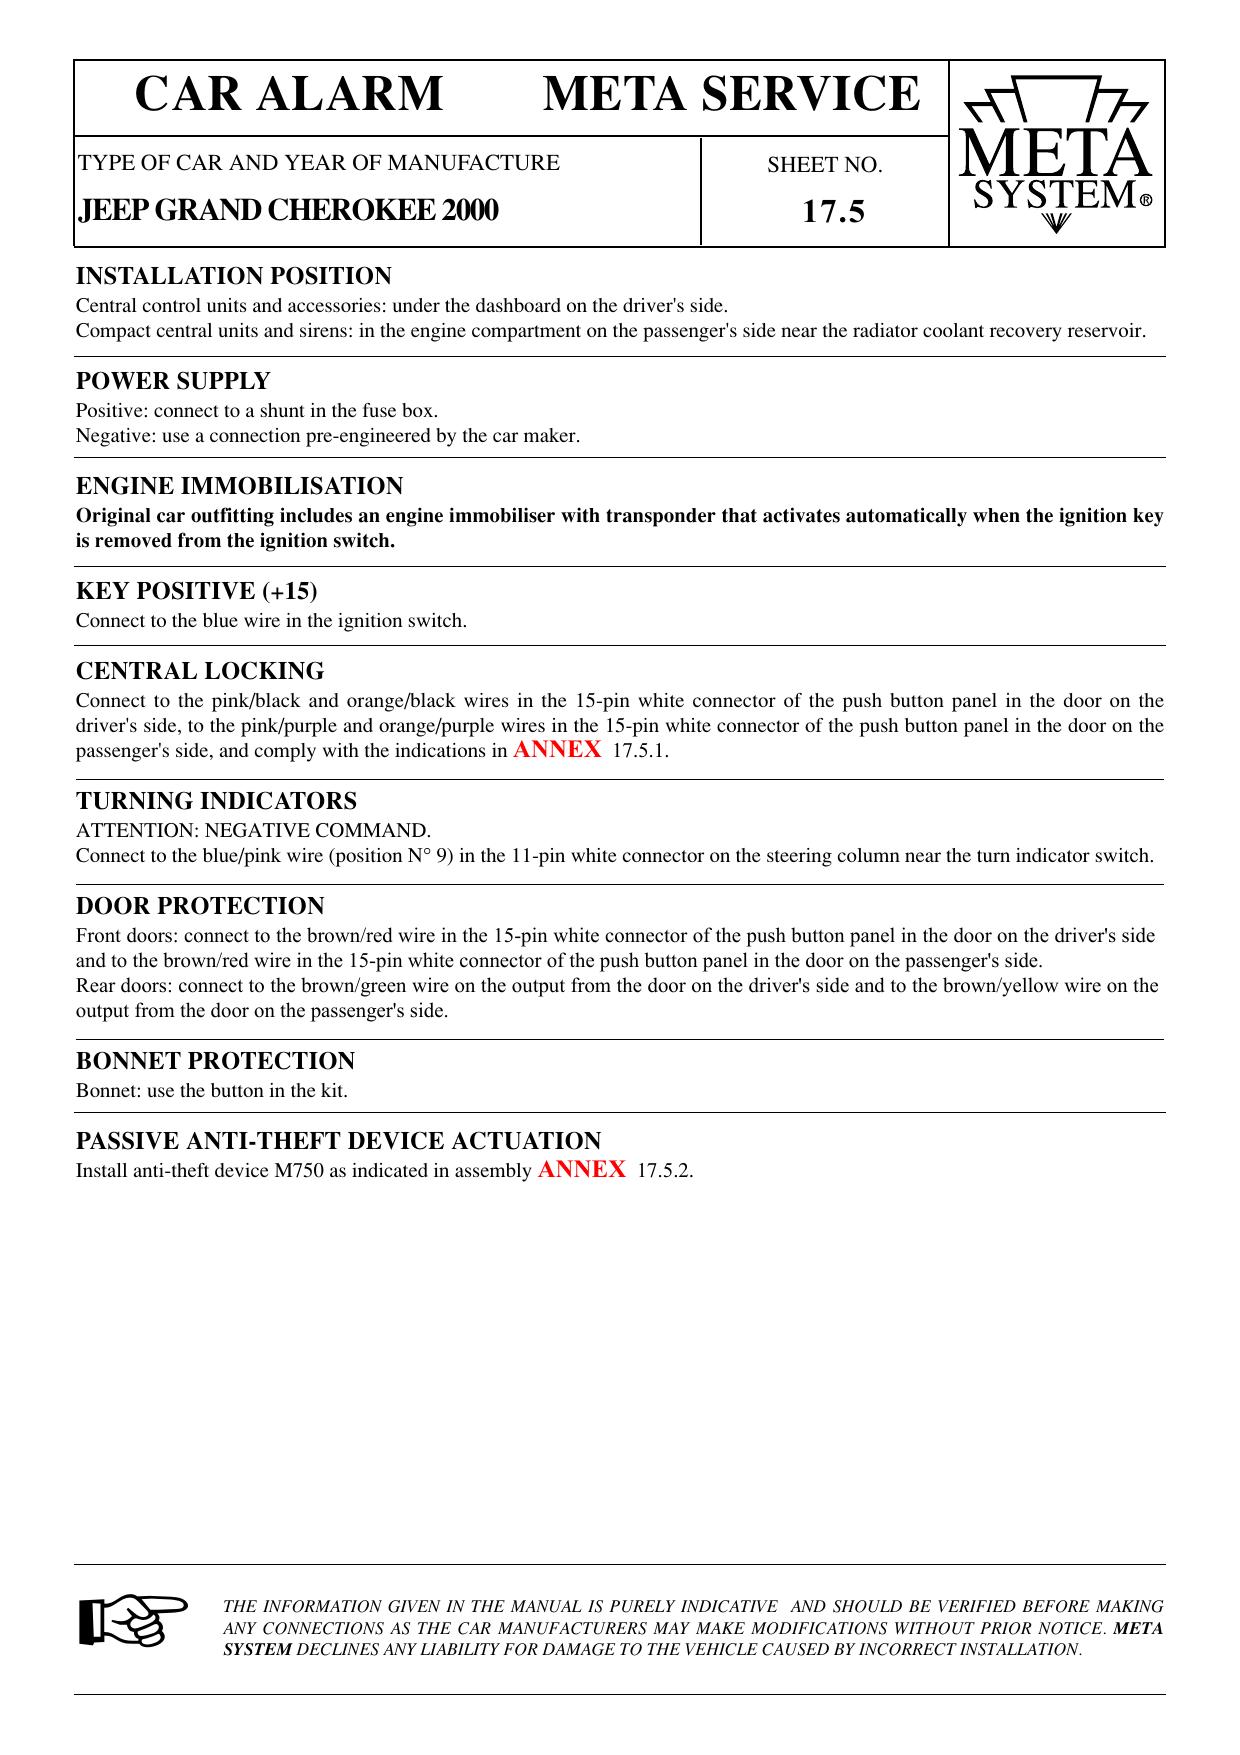 CAR ALARM META SERVICE | Manualzzmanualzz